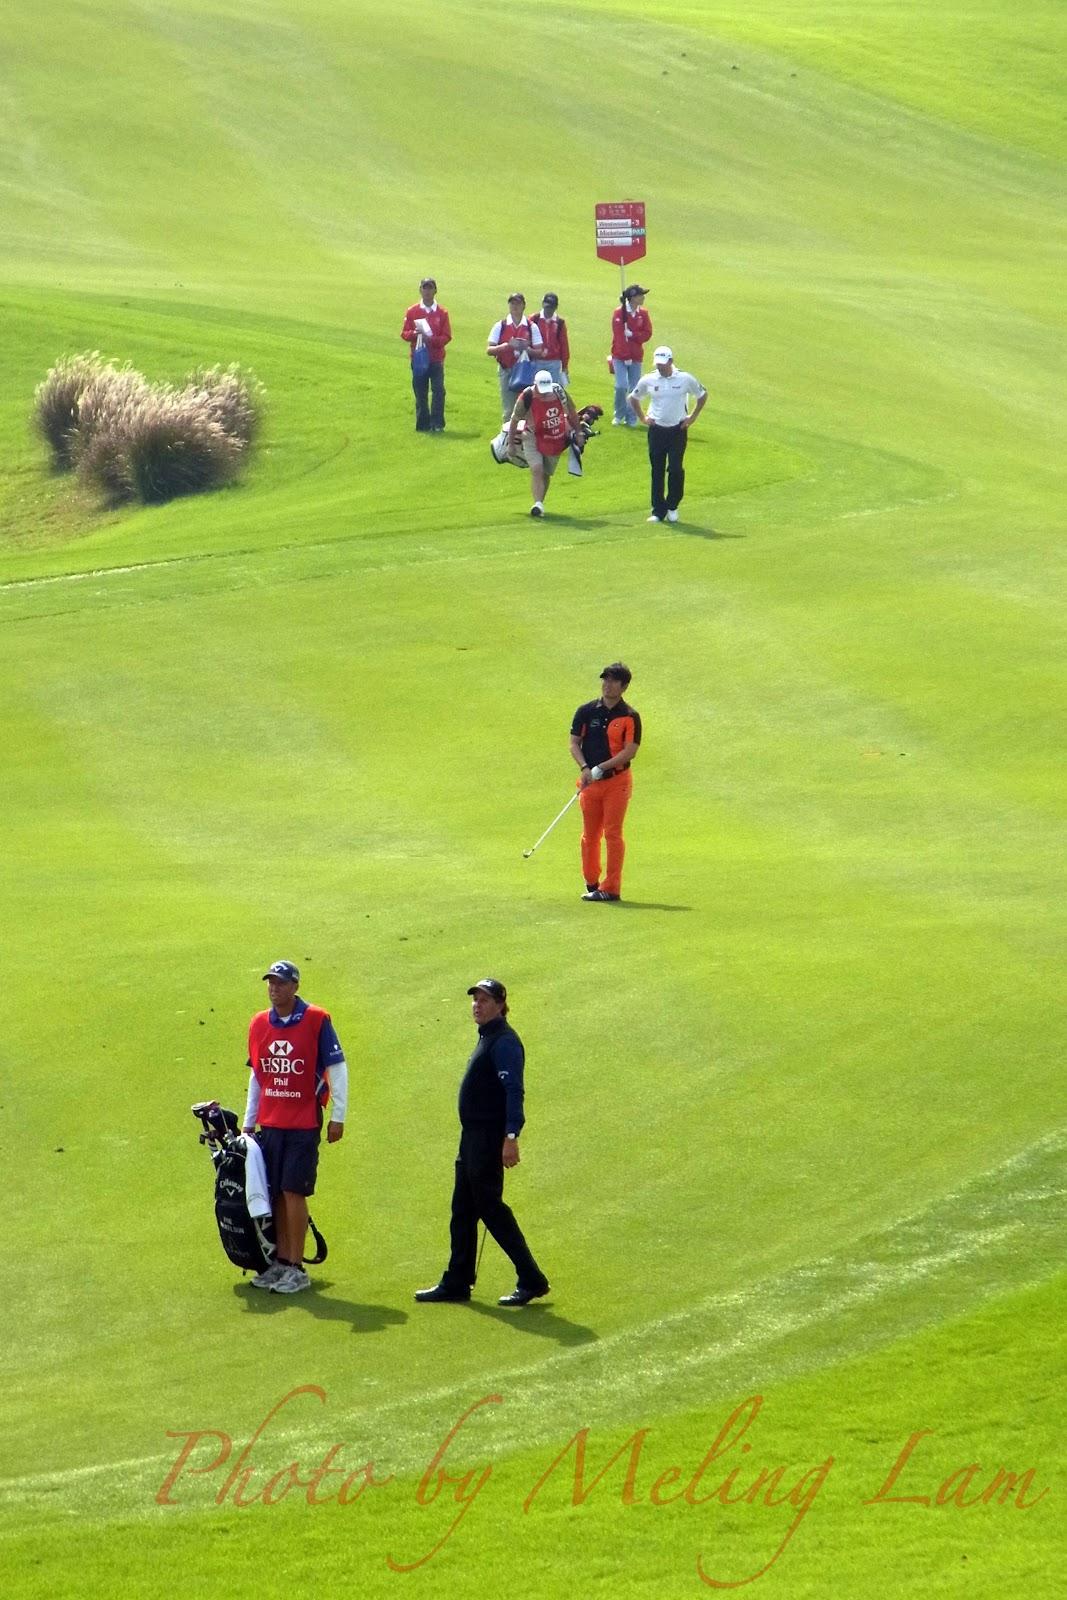 hsbc hexagon suite WGC-HSBC Golf Champions shanghai sheshan